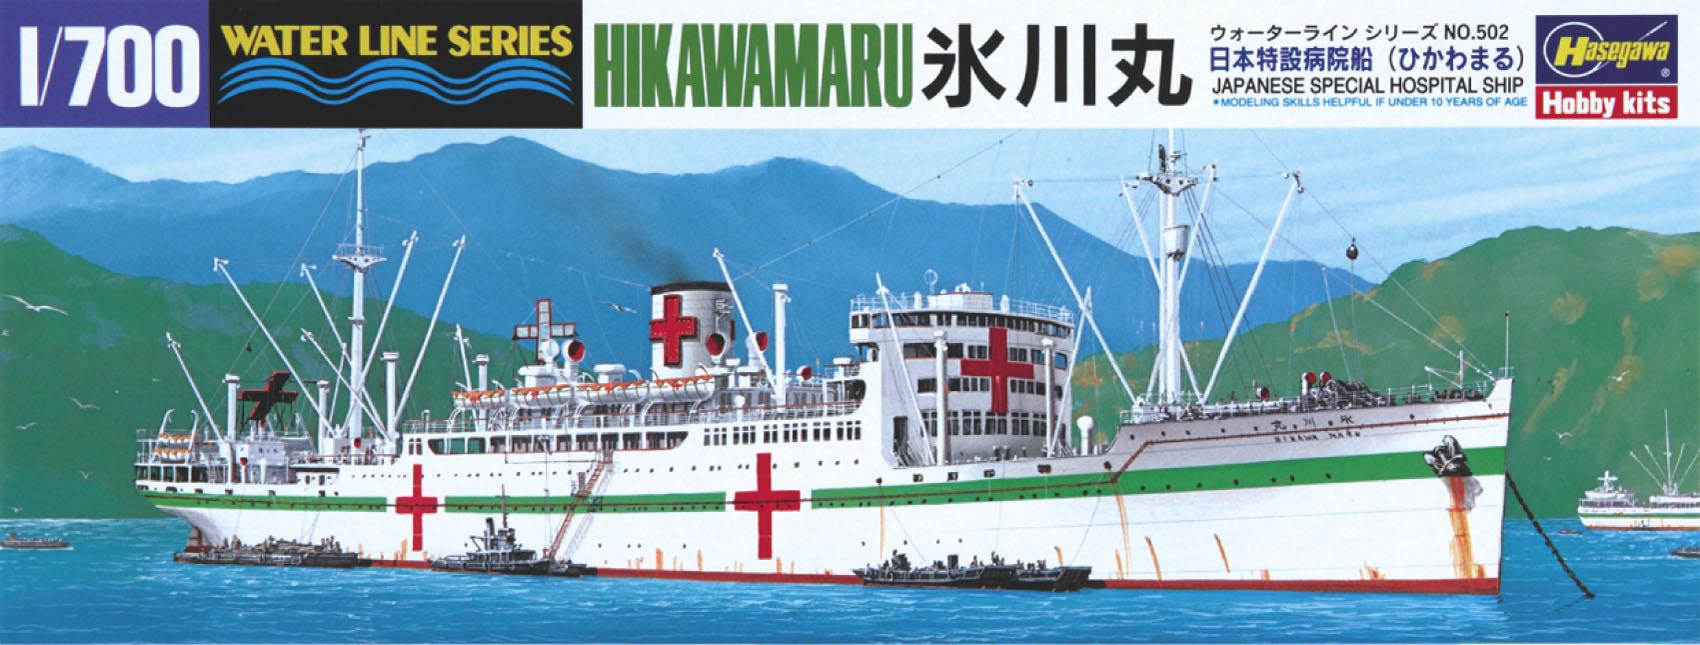 Hasegawa Ijn Hospital Ship Hikawamaru